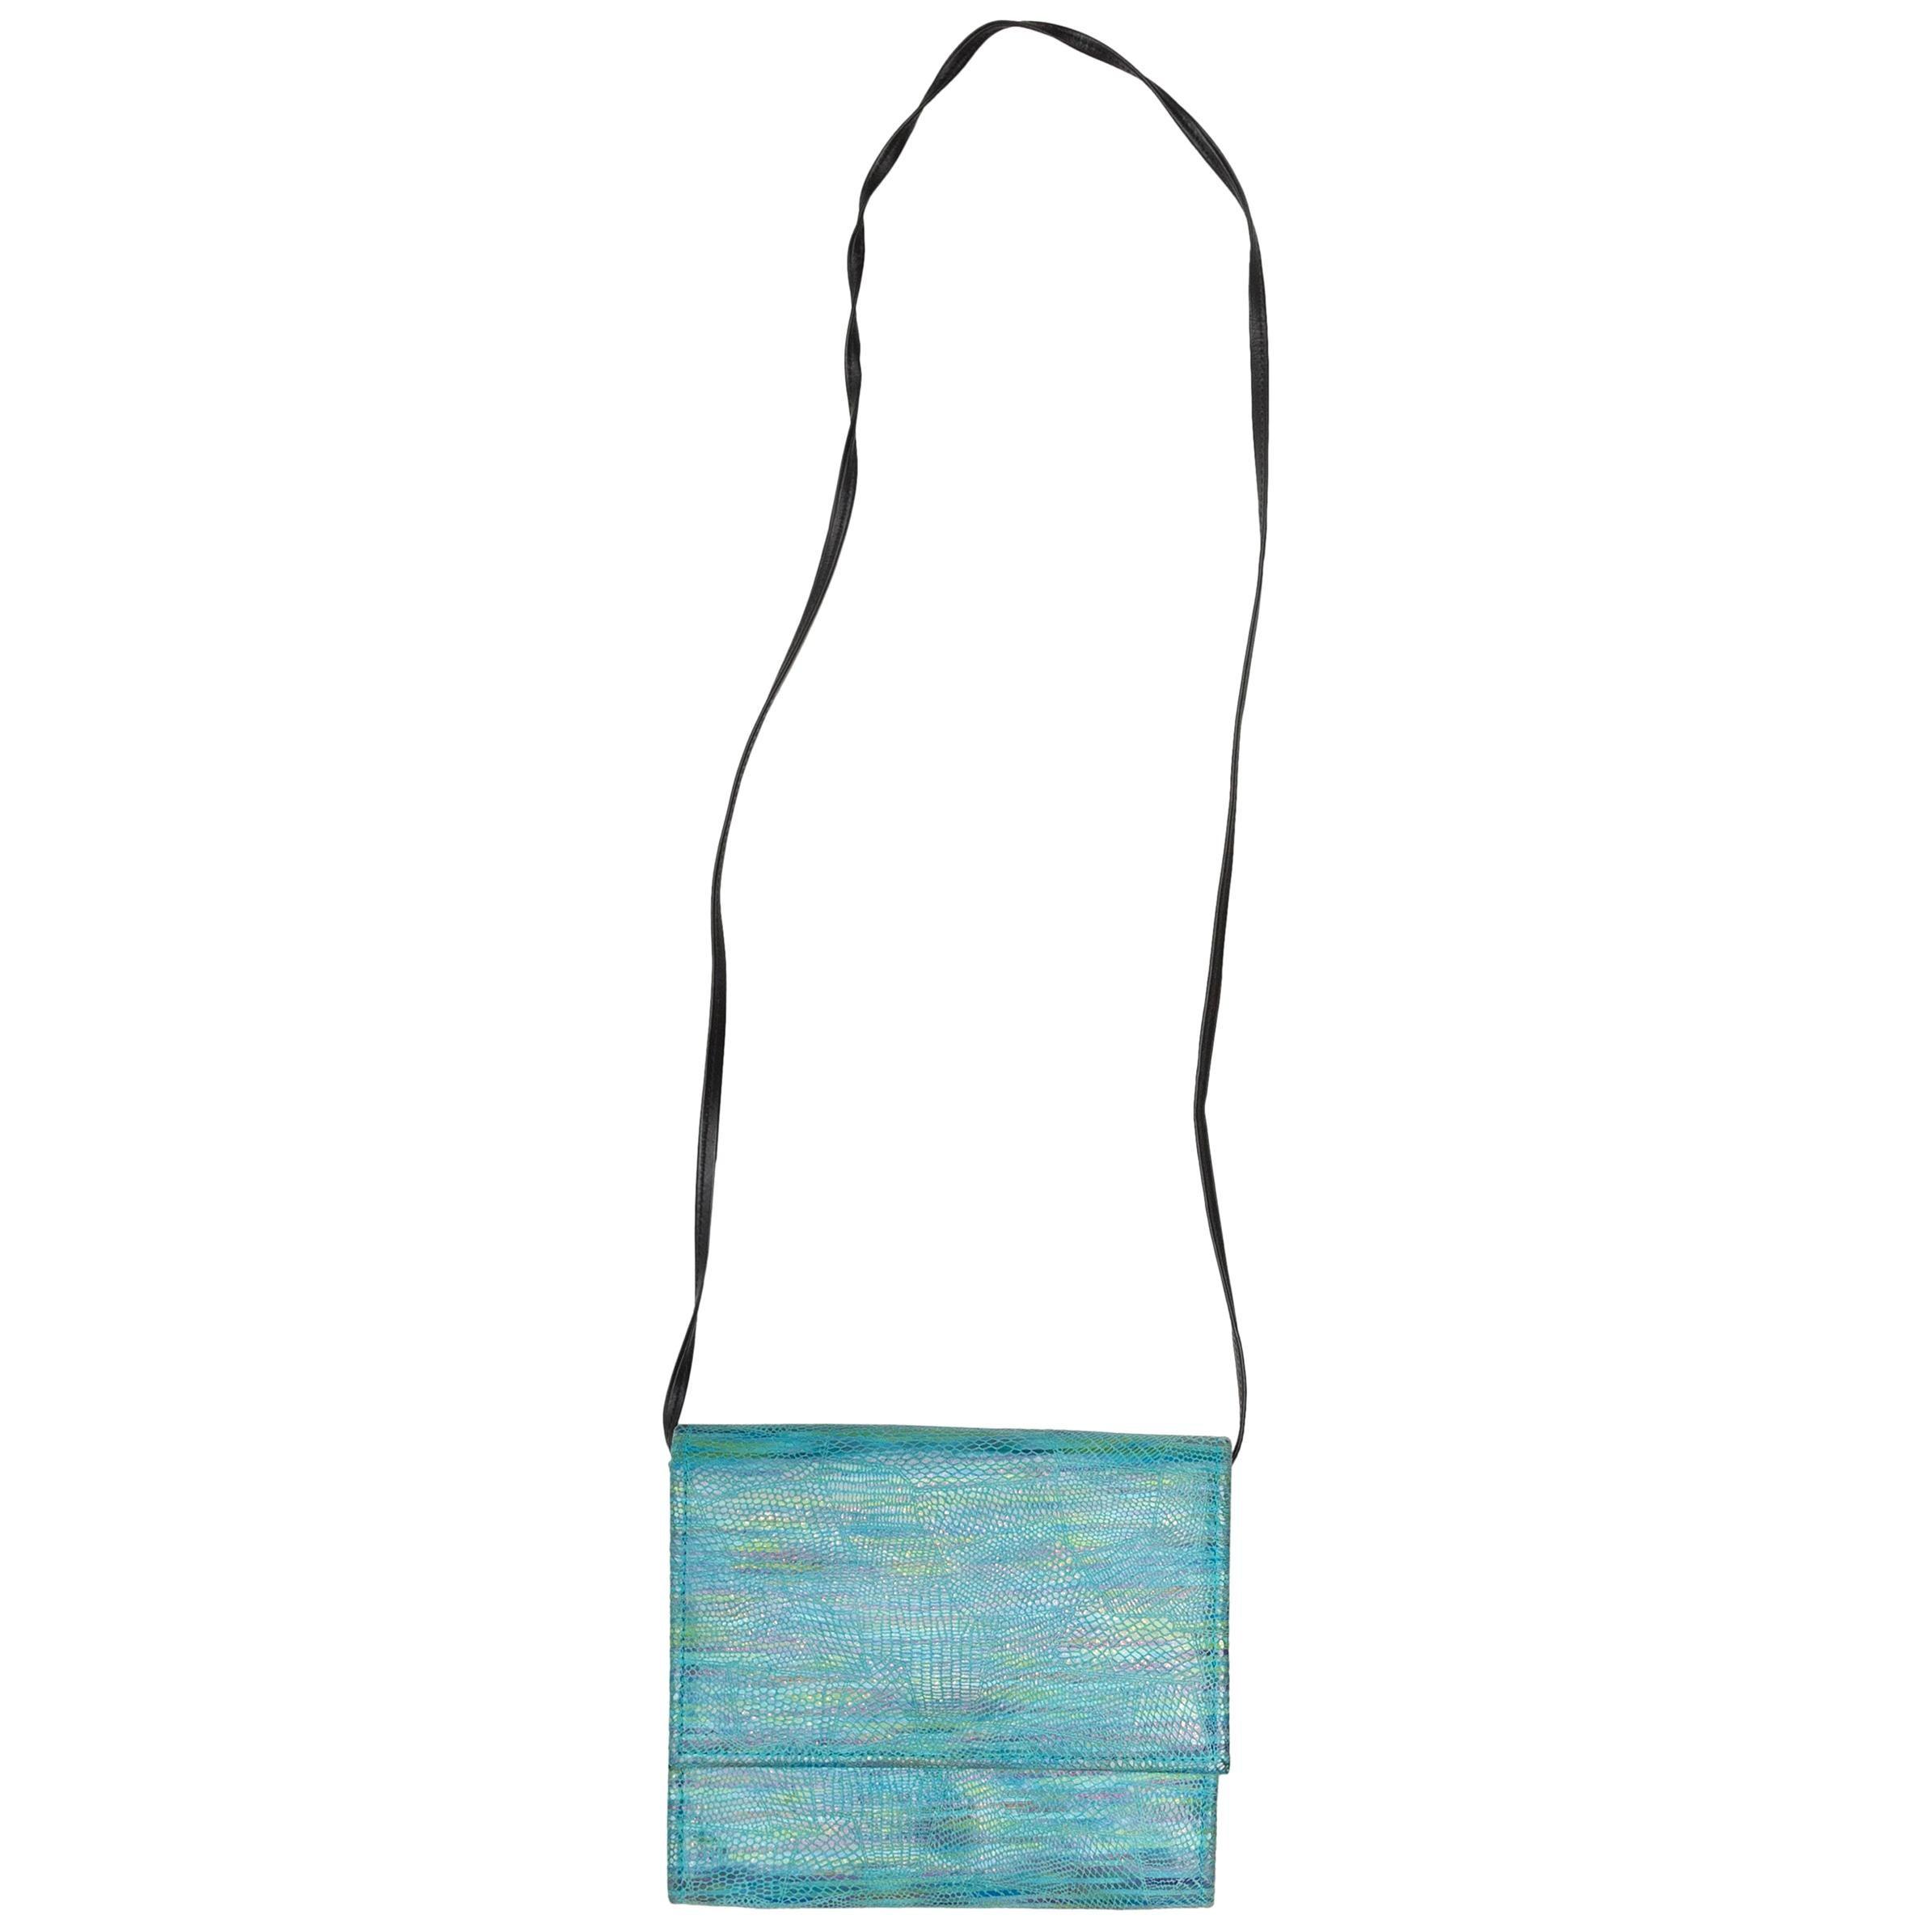 Hans Koch Turquoise Embossed Leather Crossbody Bag